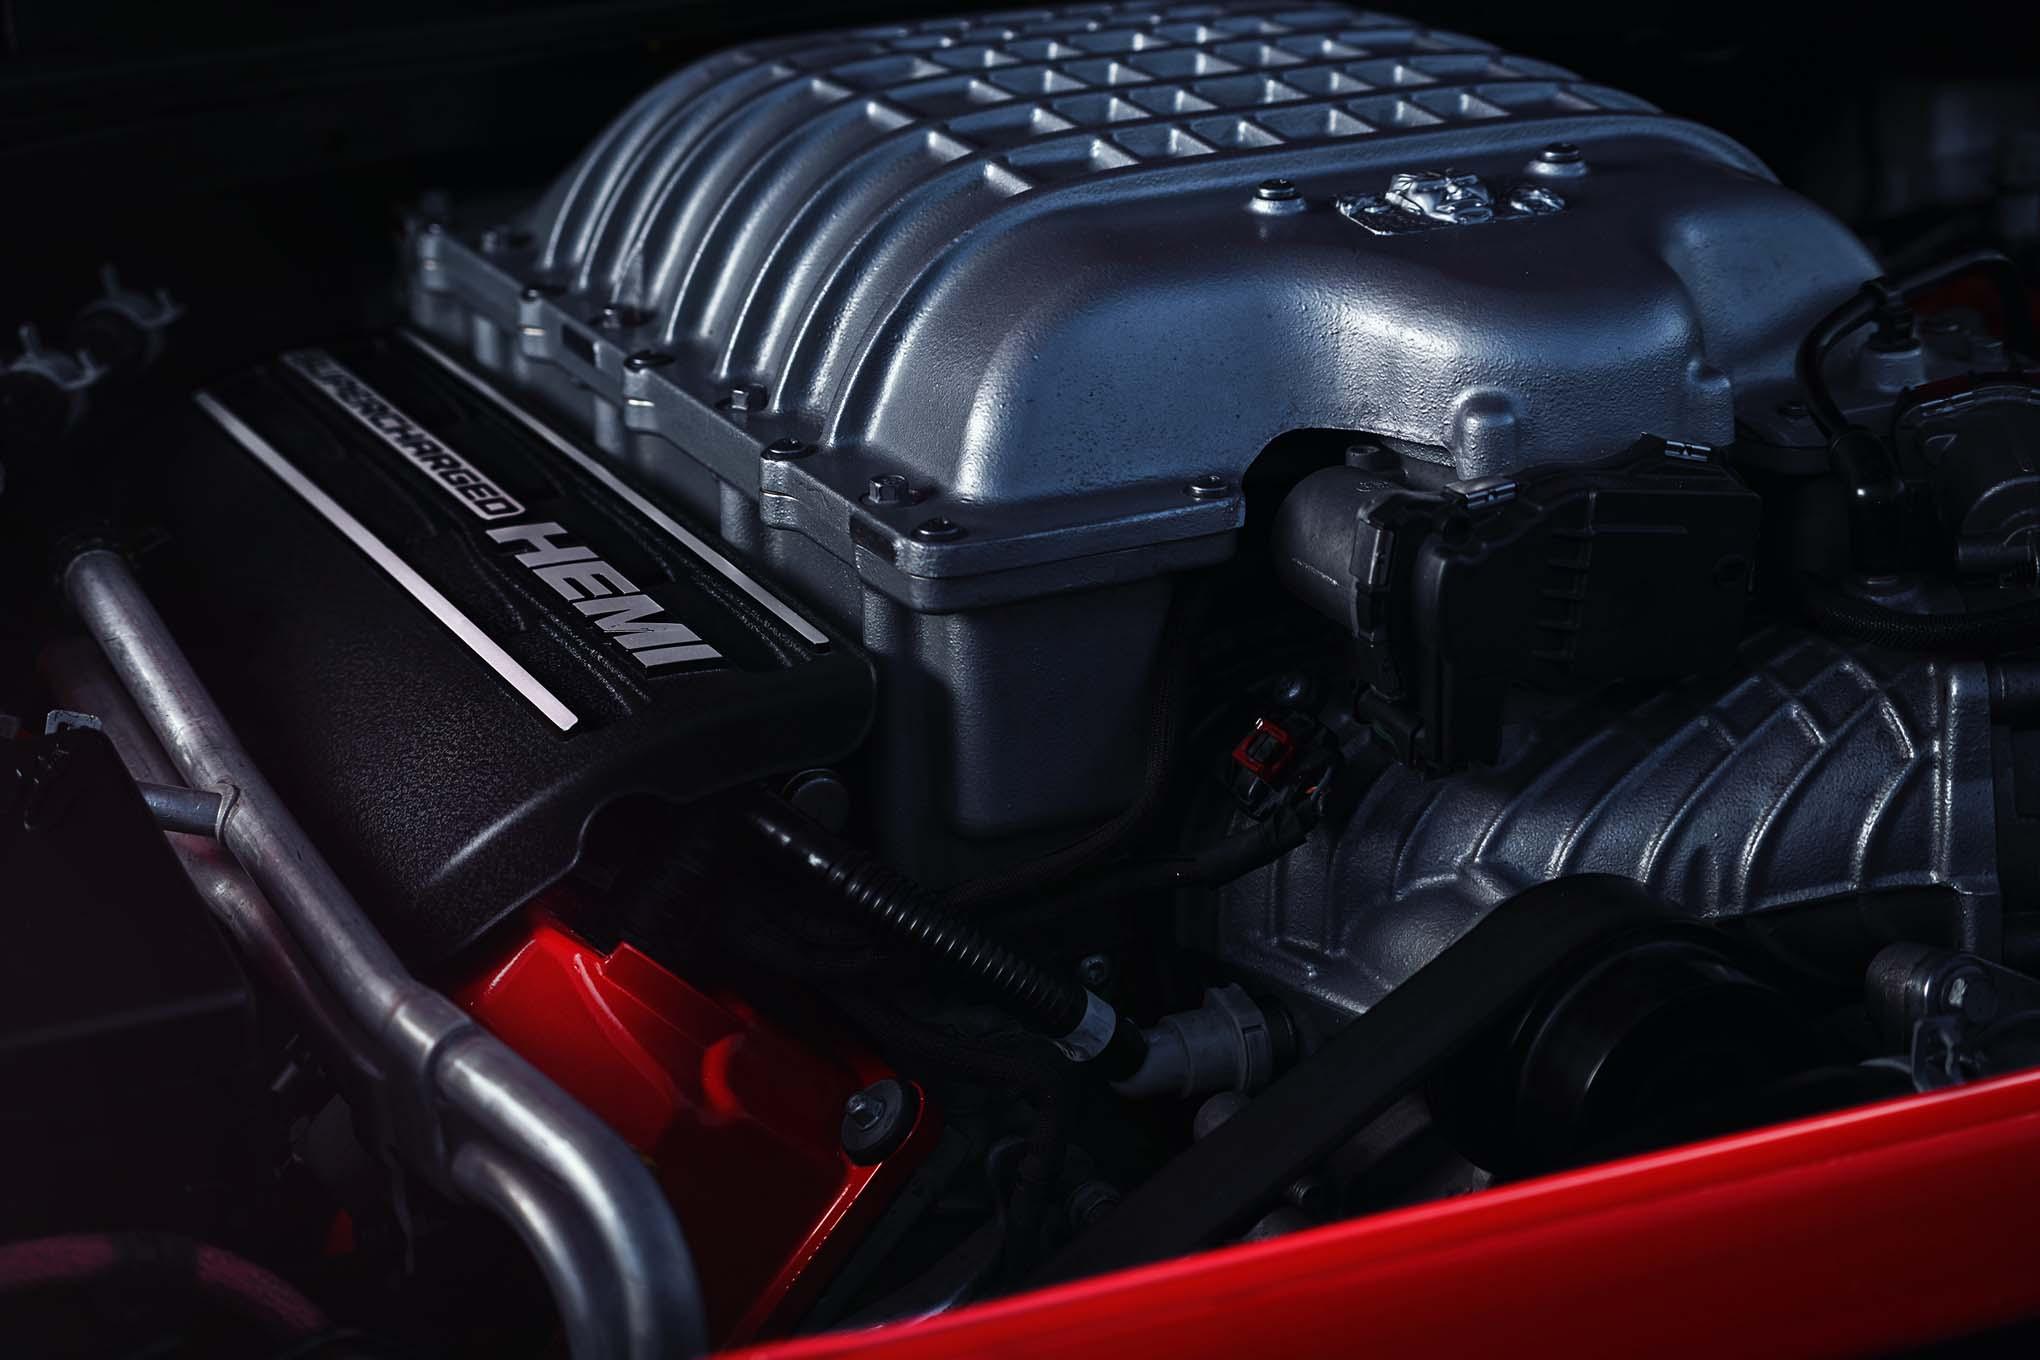 2018 Dodge Challenger Srt Demon Arrives With 840 Horsepower For The Sprinter Fuel Filters 58 155